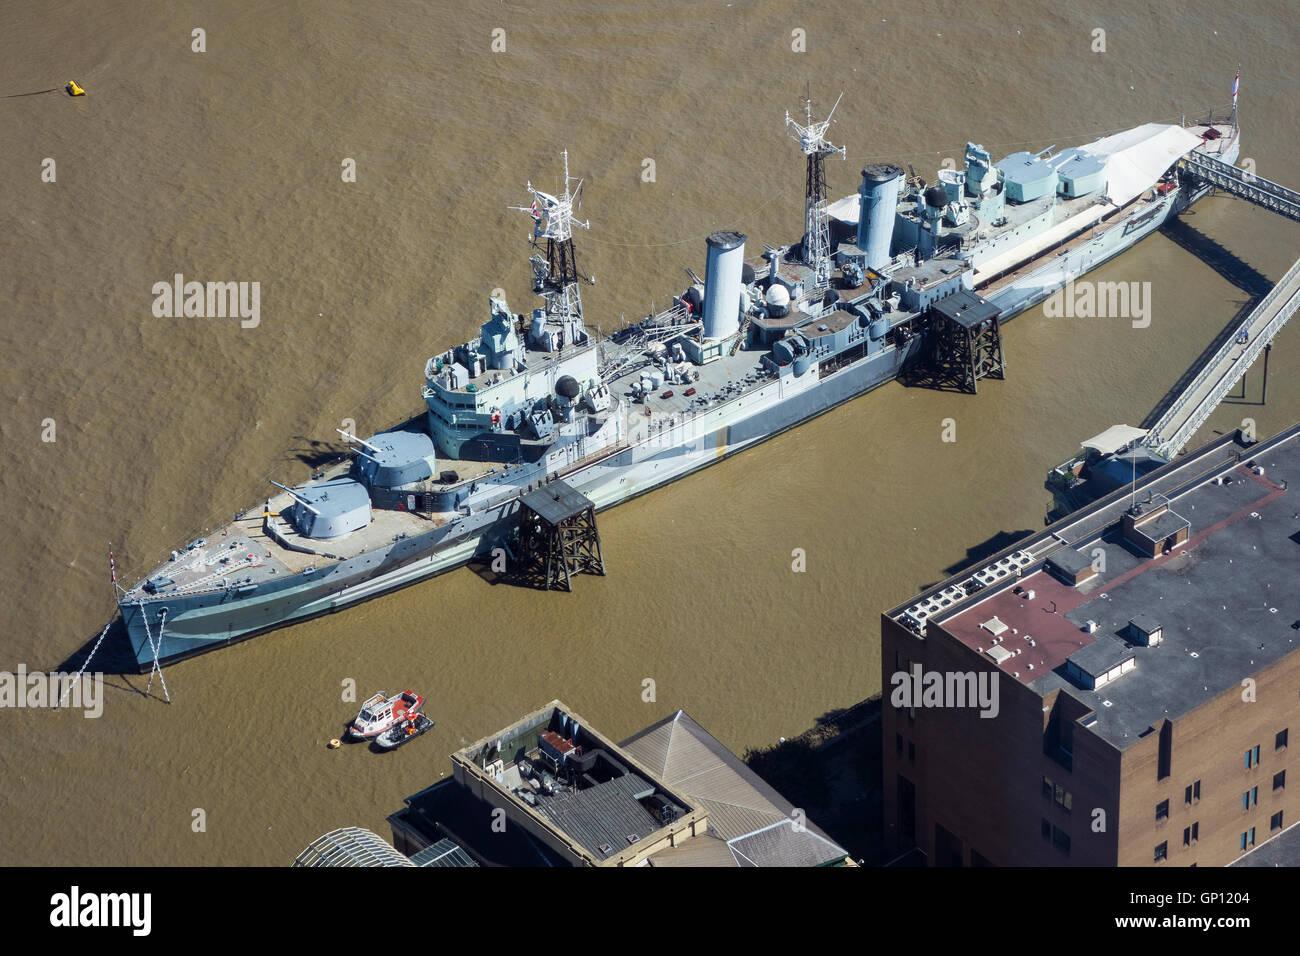 England, London, HMS Belfast & River Thames, aerial - Stock Image